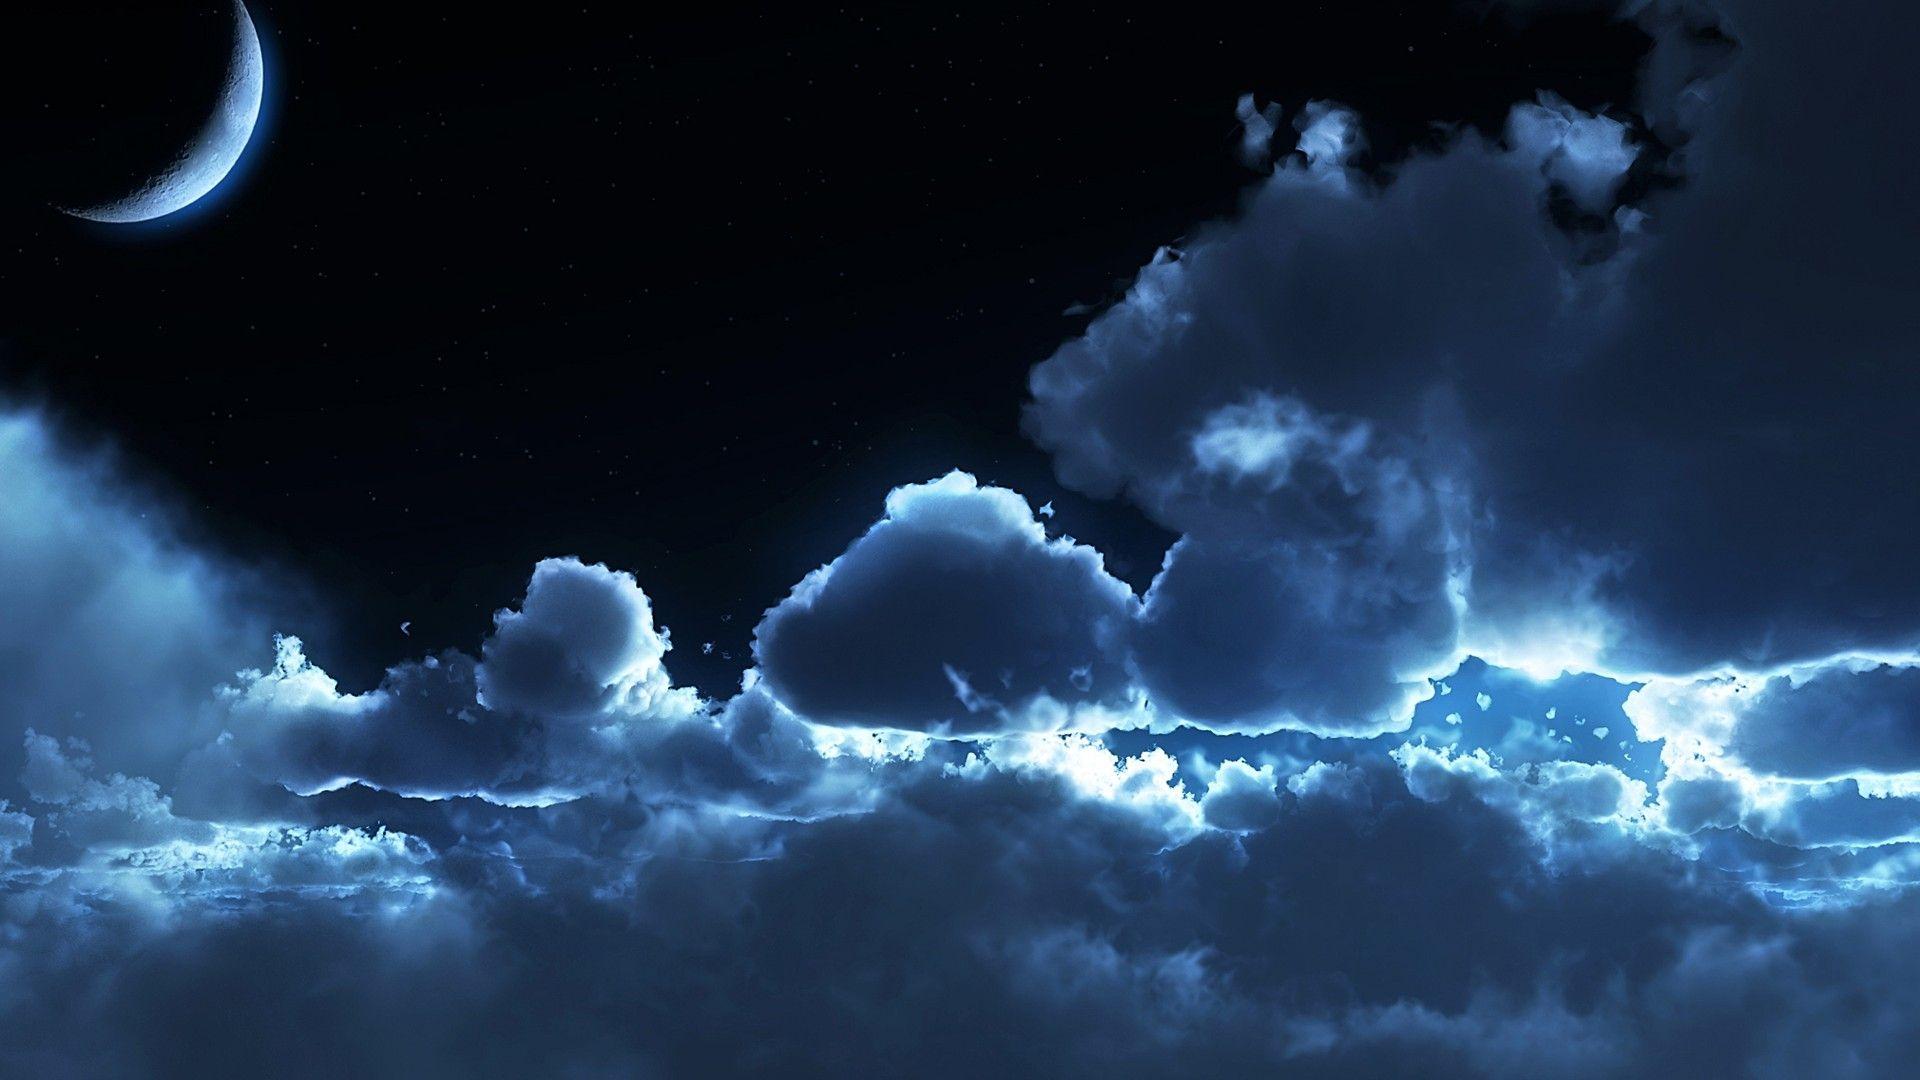 Nature Space おしゃれまとめの人気アイデア Pinterest 大西広司 美しい風景 雲 風景